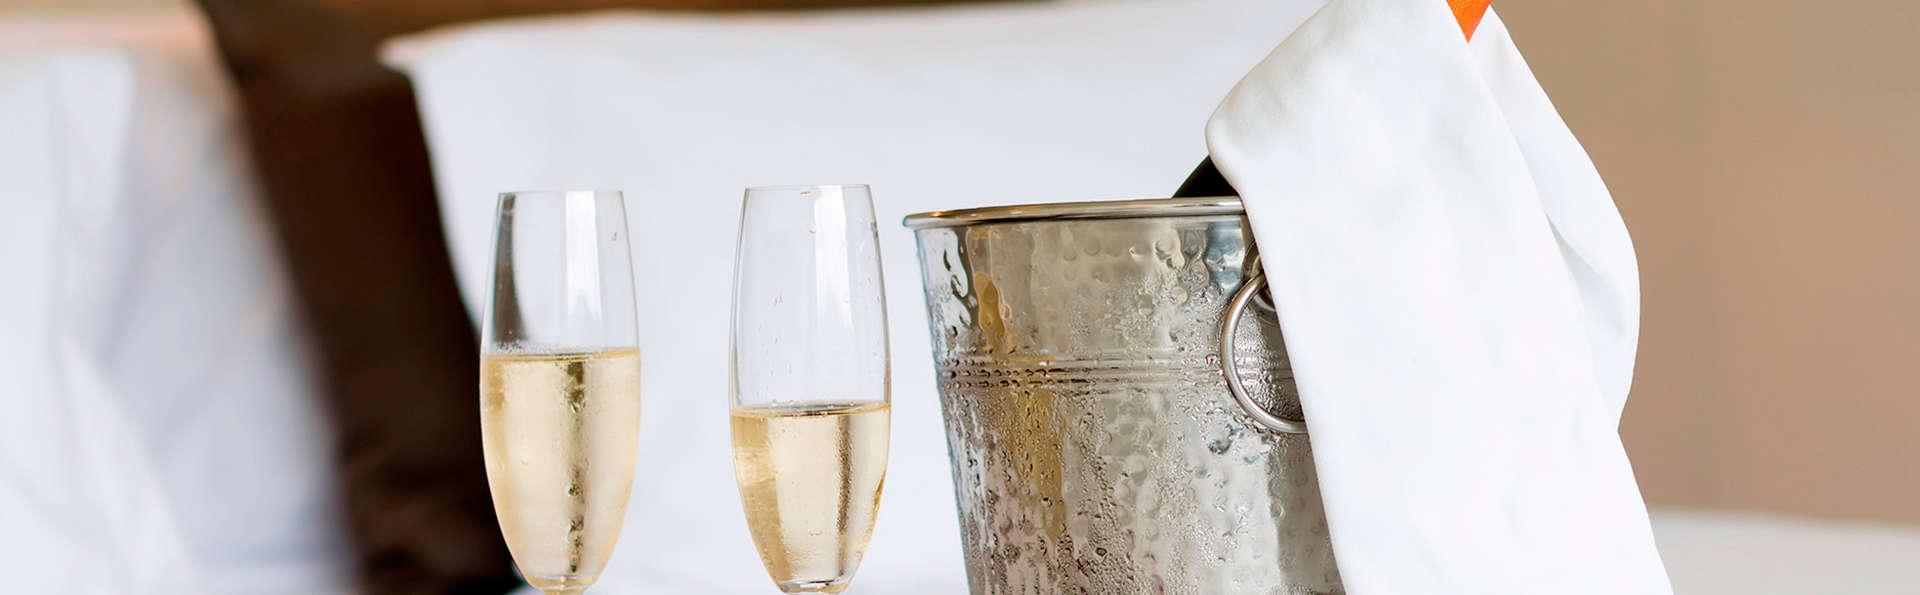 Romantiek, luxe en bubbels in Mechelen